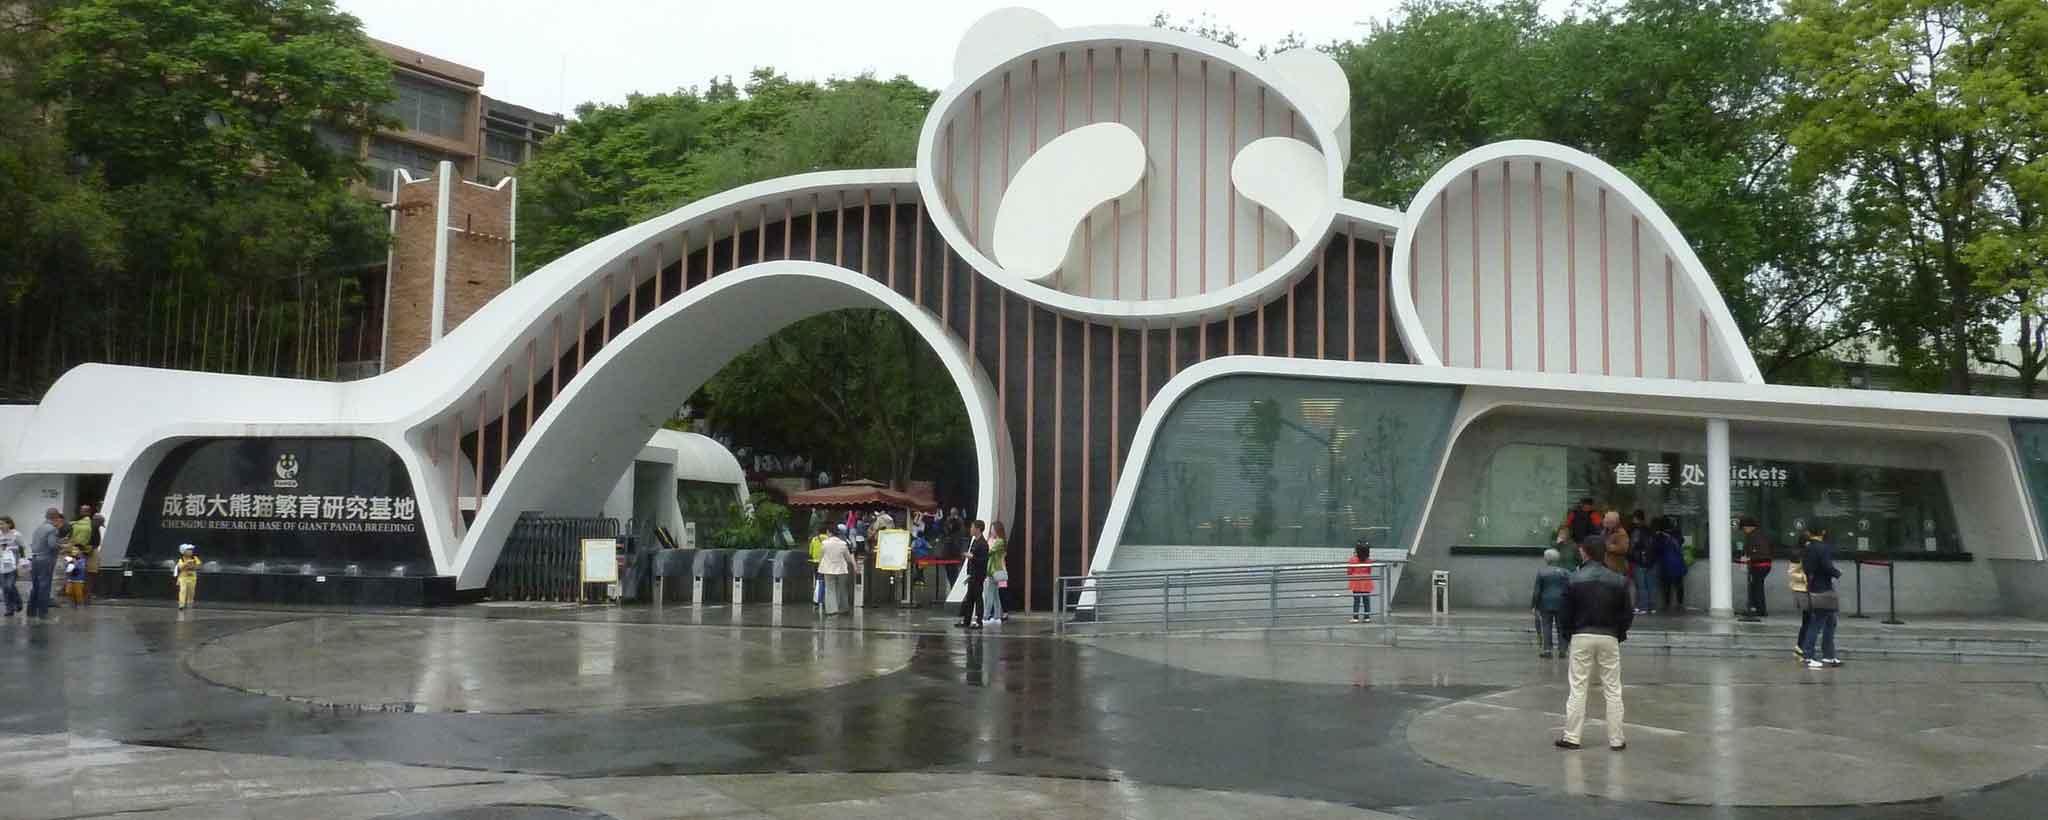 Virtual reality comes to Chengdu Research Base of Giant Panda Breeding